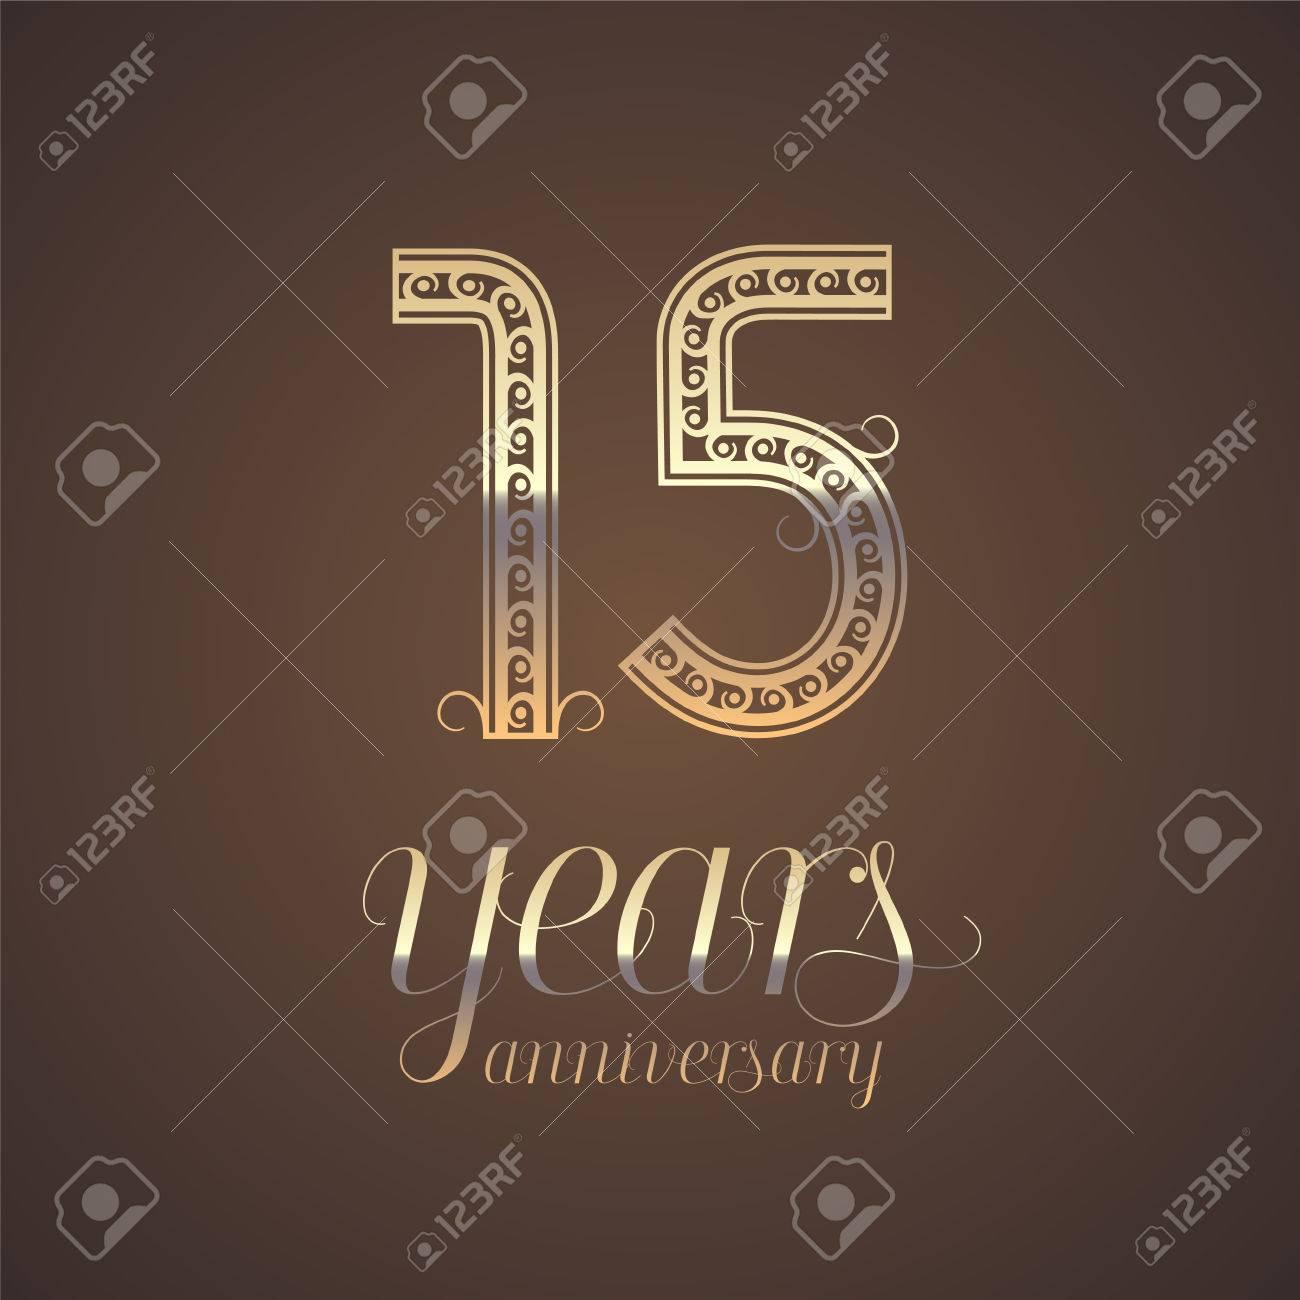 15 Years Anniversary Vector Icon Symbol Graphic Design Element